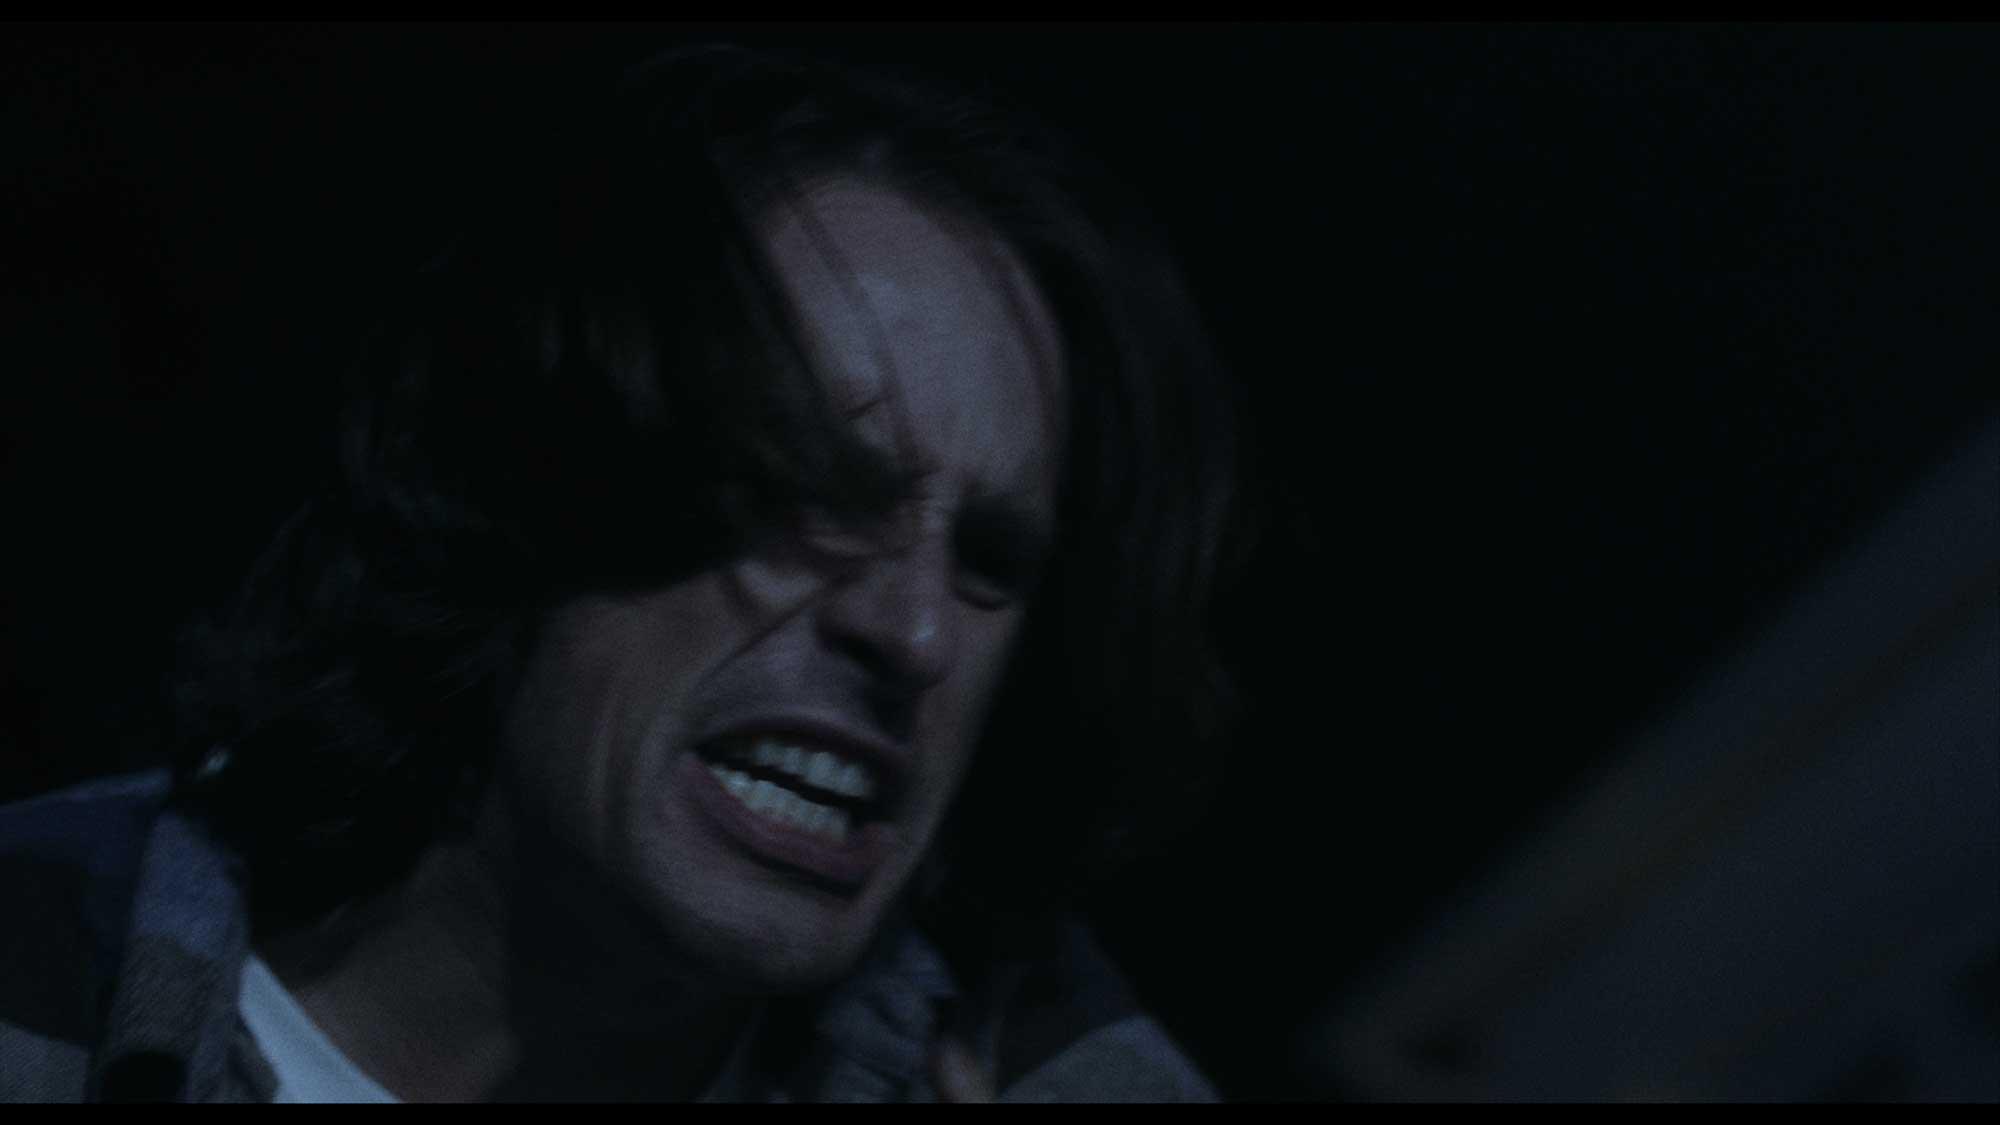 Jason-Angry.jpg